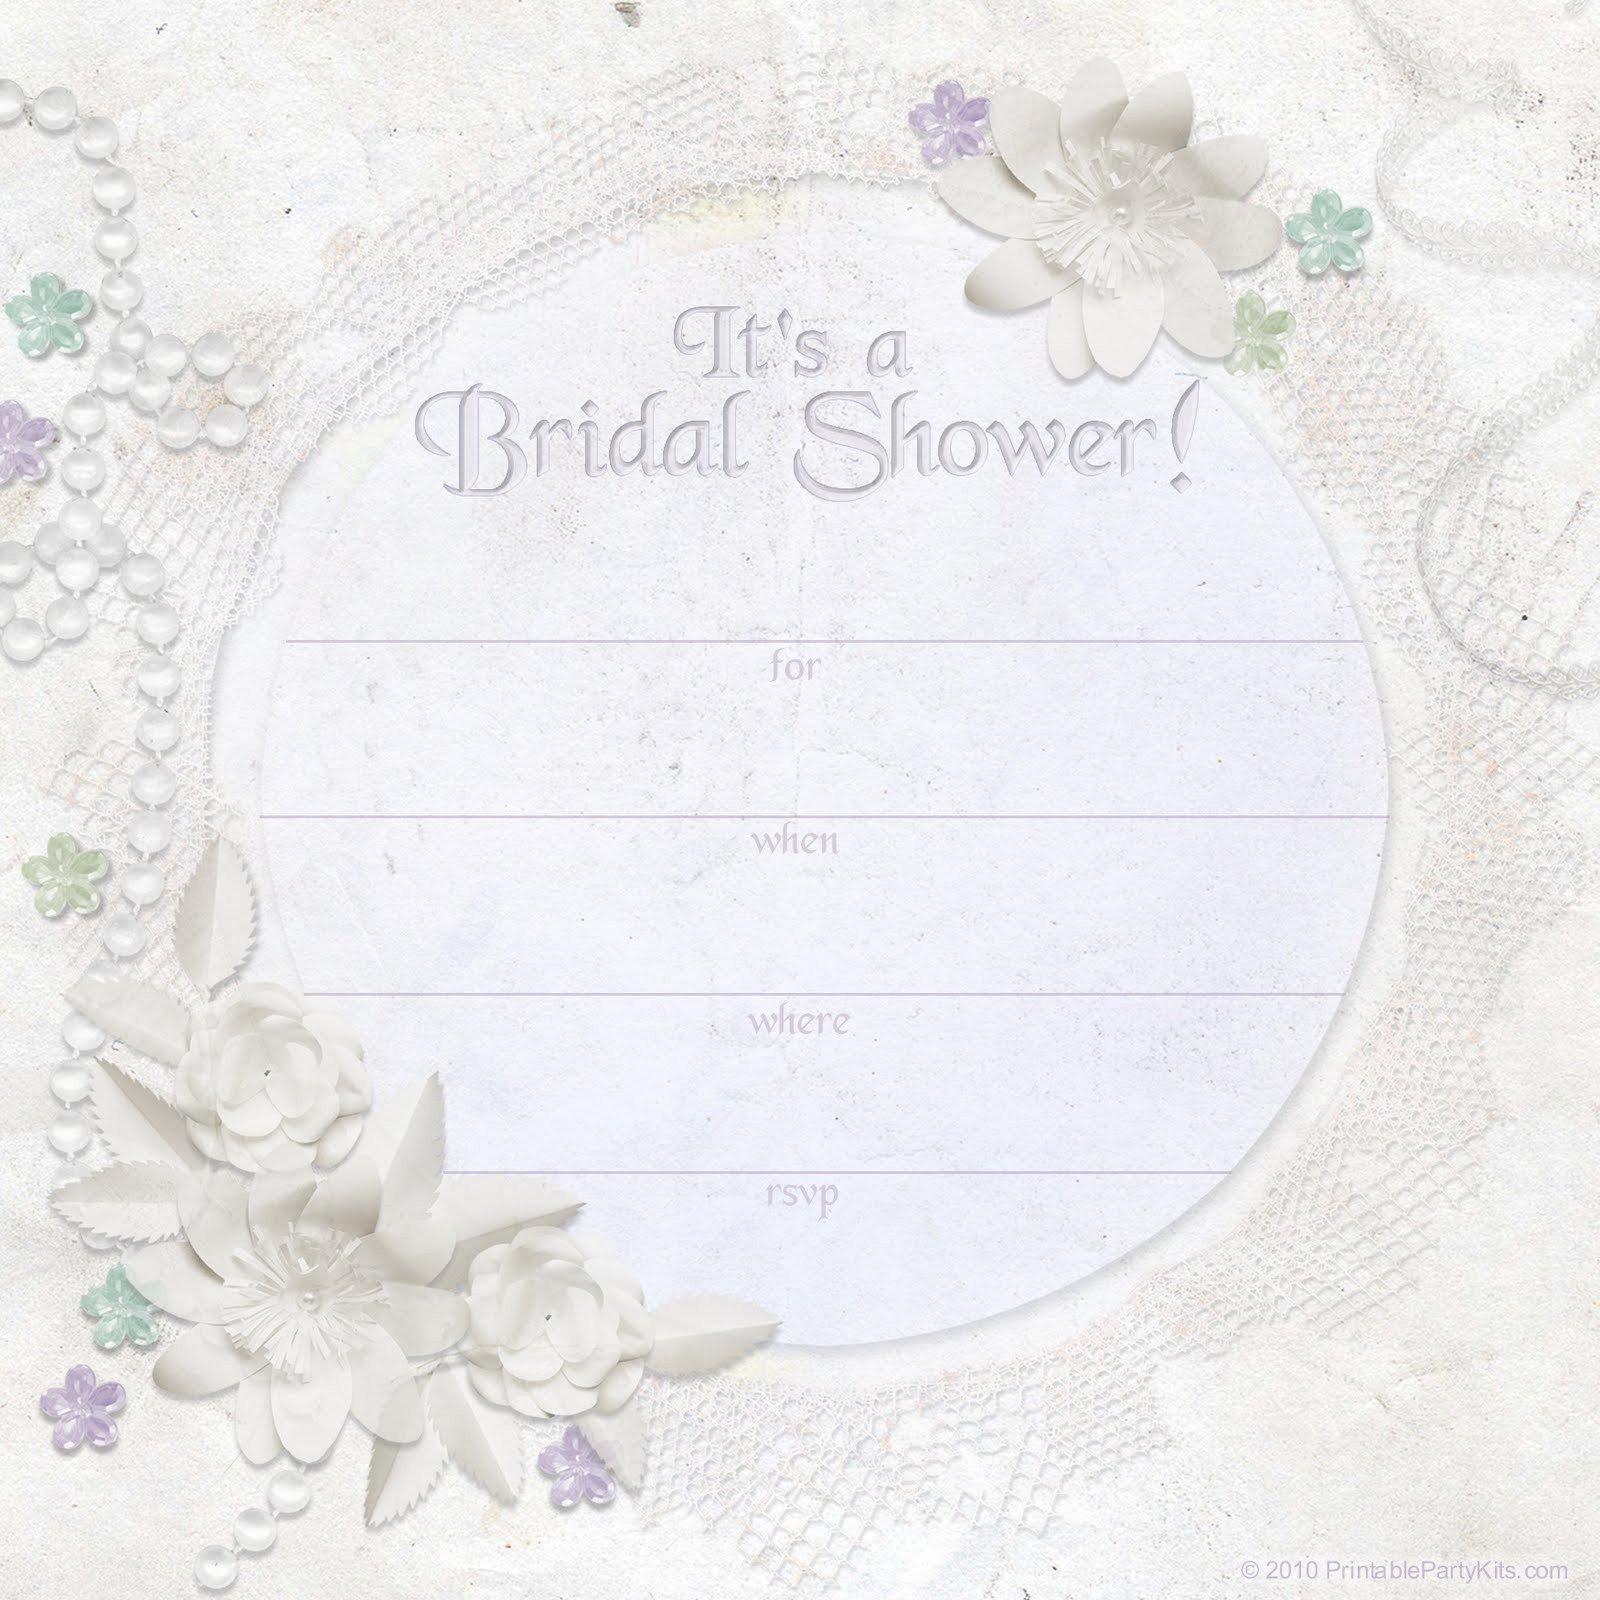 Free Bridal Shower Invitation Templates Free Printable Party Invitations Ivory Dreams Bridal